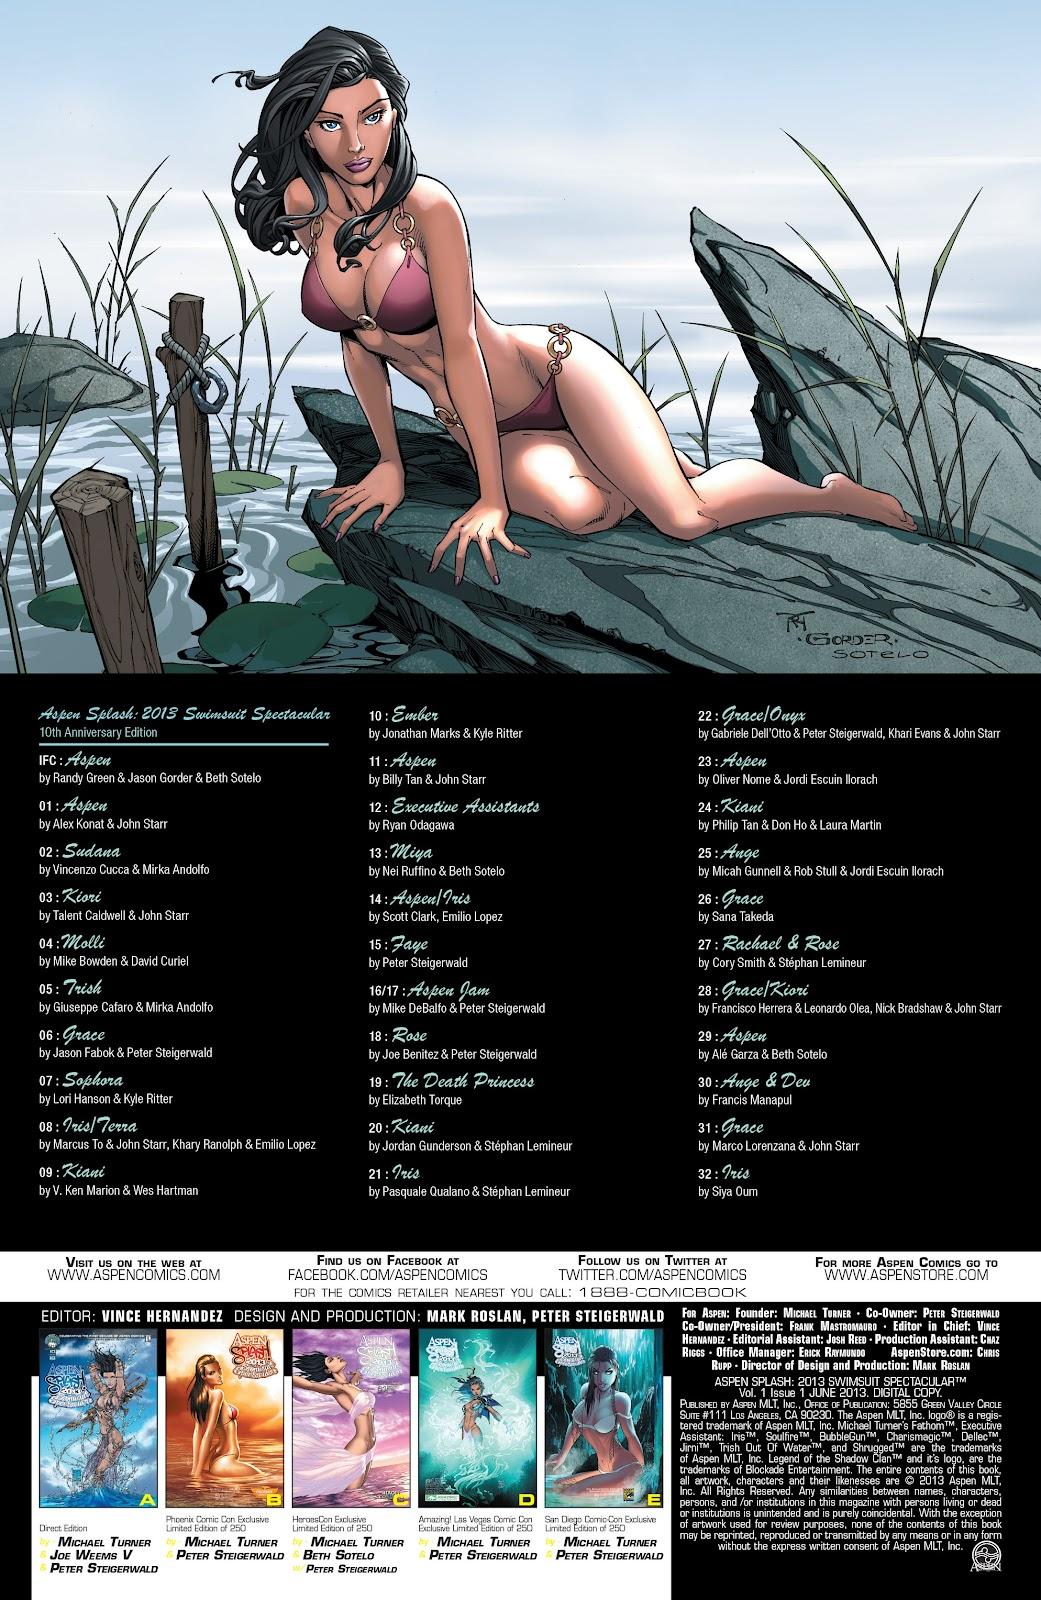 Read online Aspen Splash: Swimsuit Spectacular comic -  Issue # Issue 2013 - 2